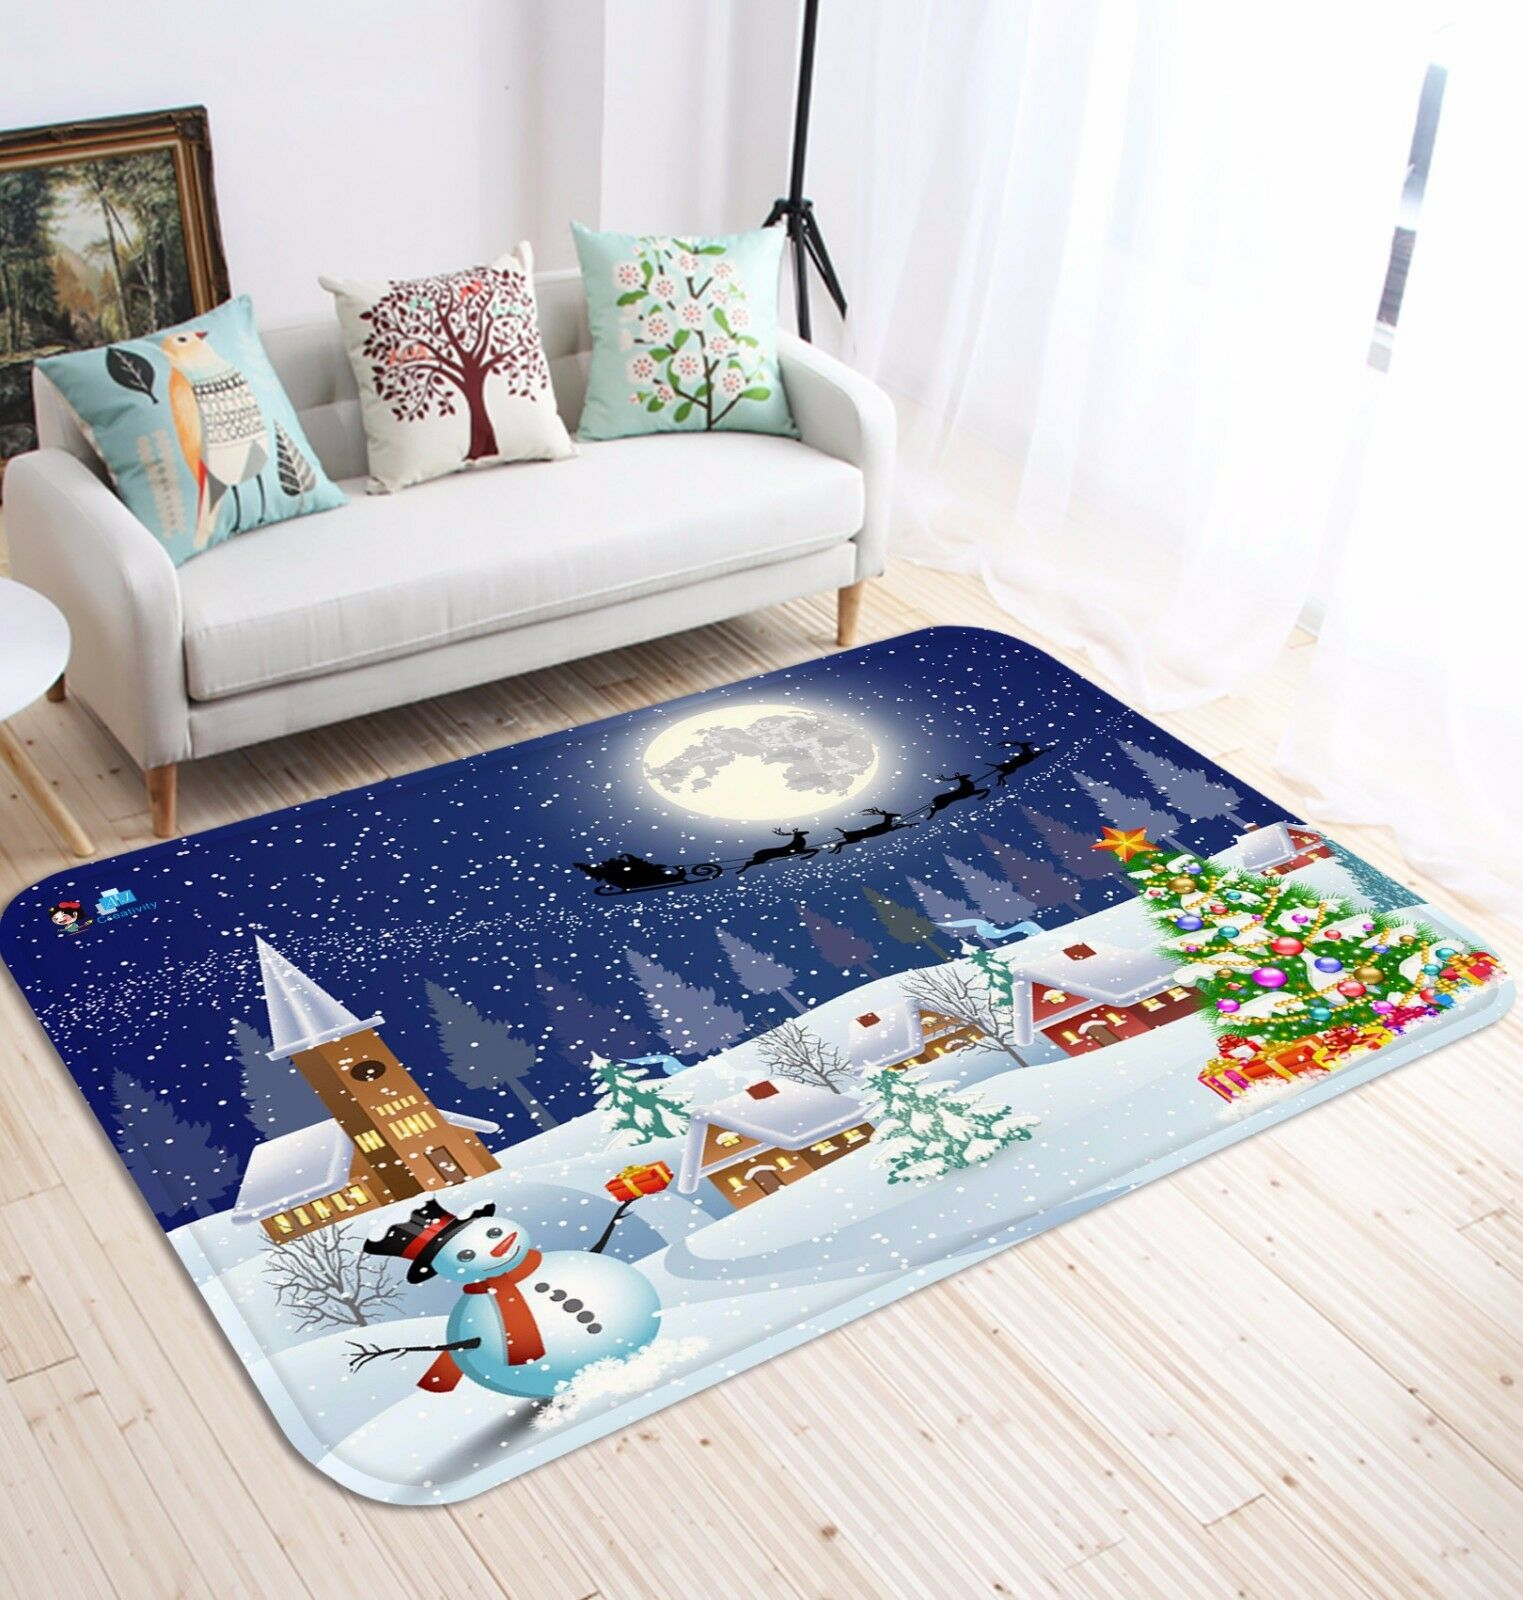 3D NEVICANDO ROAD 47 tappetino antiscivolo tappeto camera Tappetino Qualità Elegante foto Tappeto UK